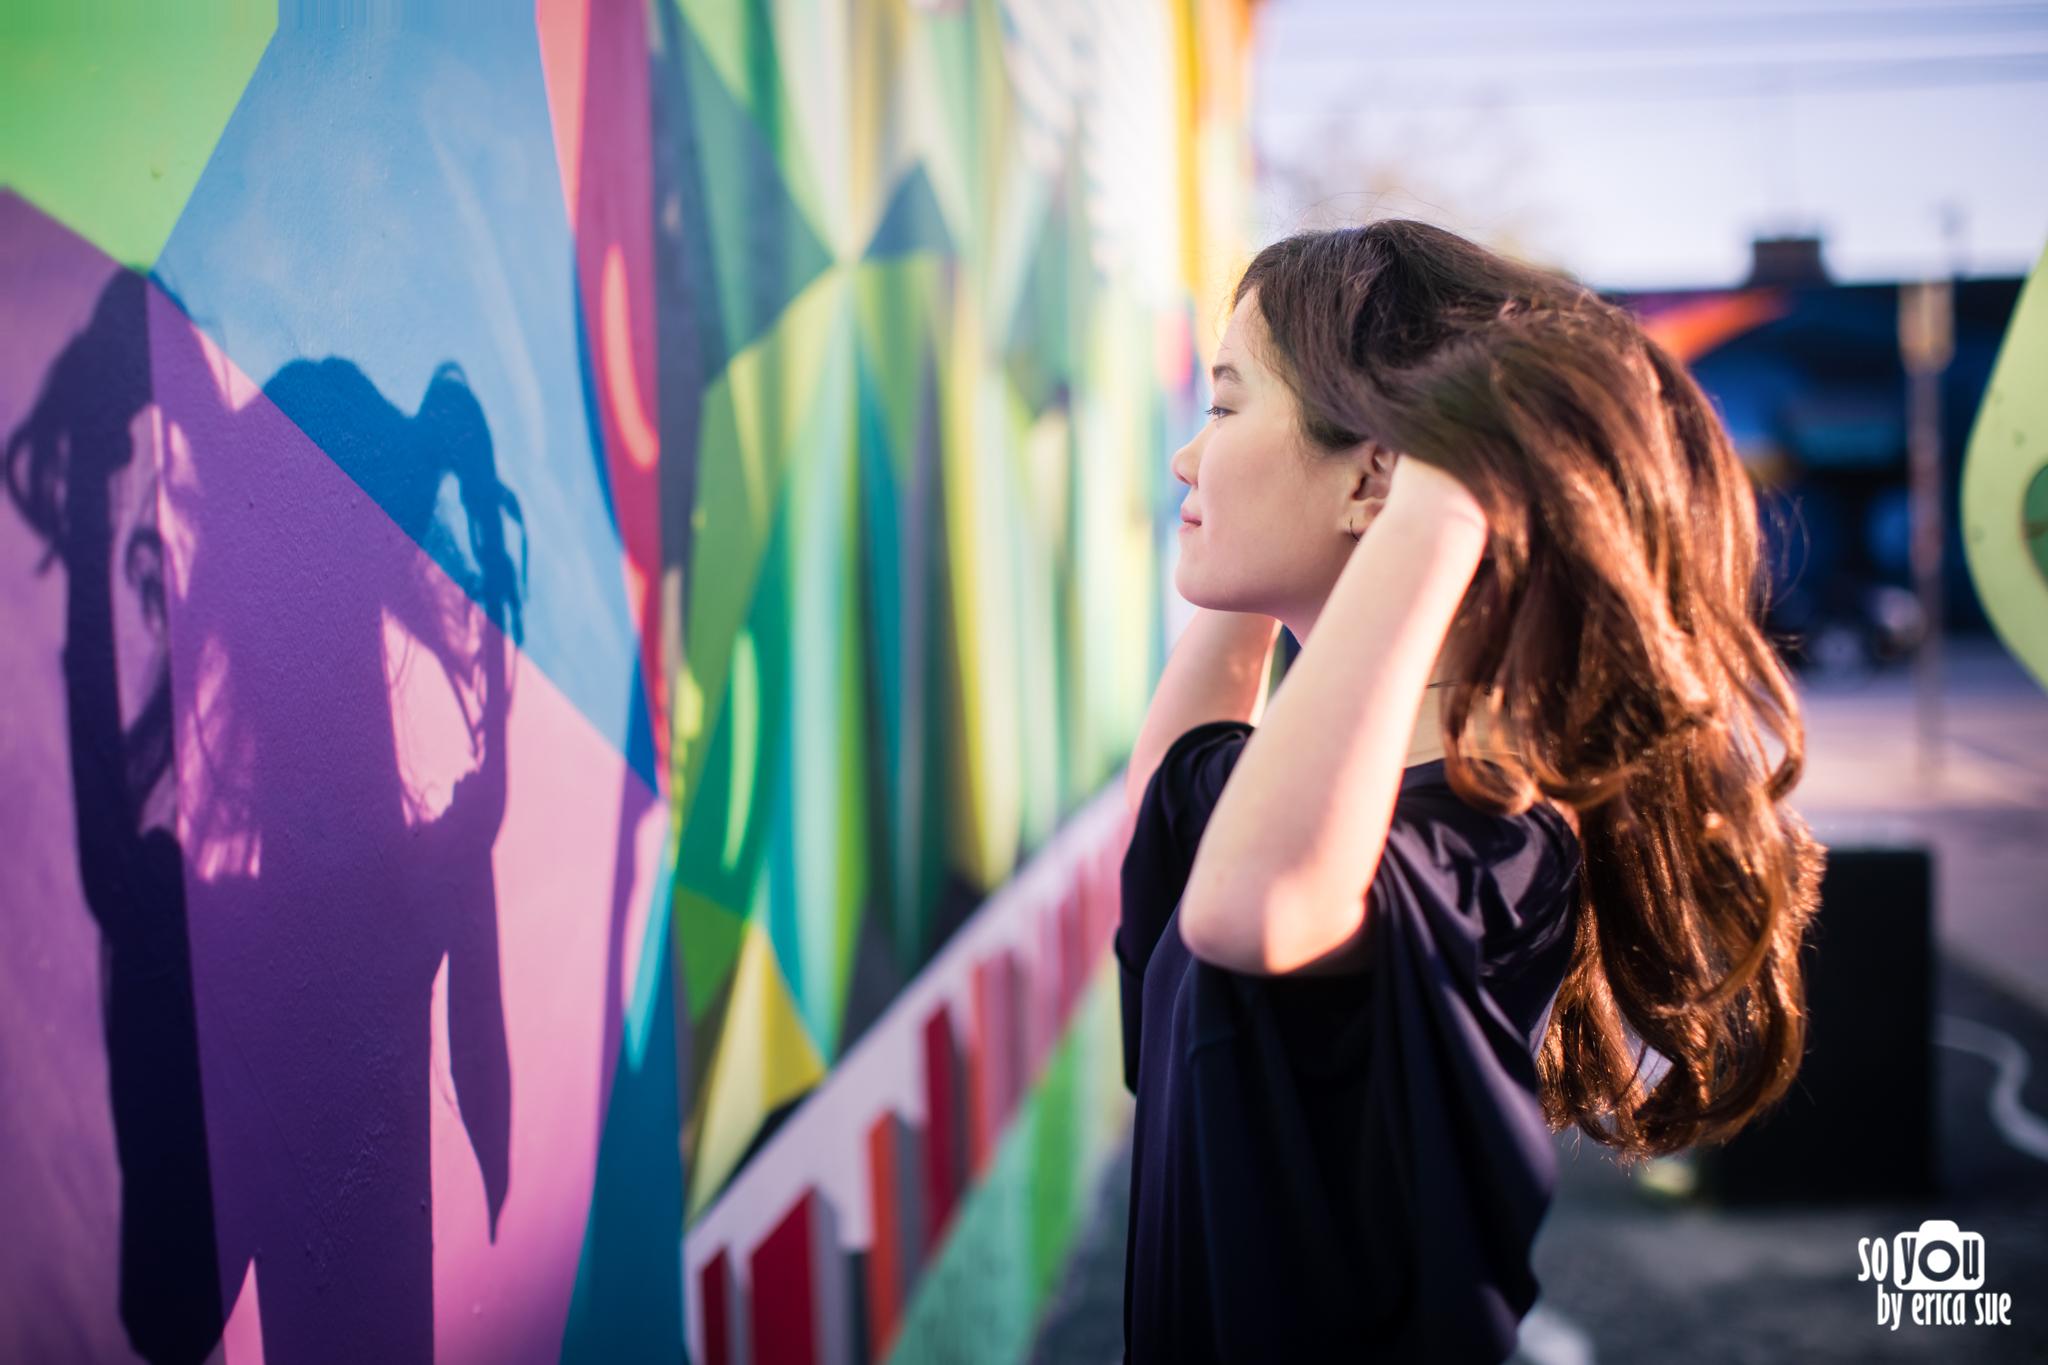 so-you-by-erica-sue-mitzvah-pre-shoot-photoshoot-wynwood-walls-miami-davie-fl-photography-.jpg